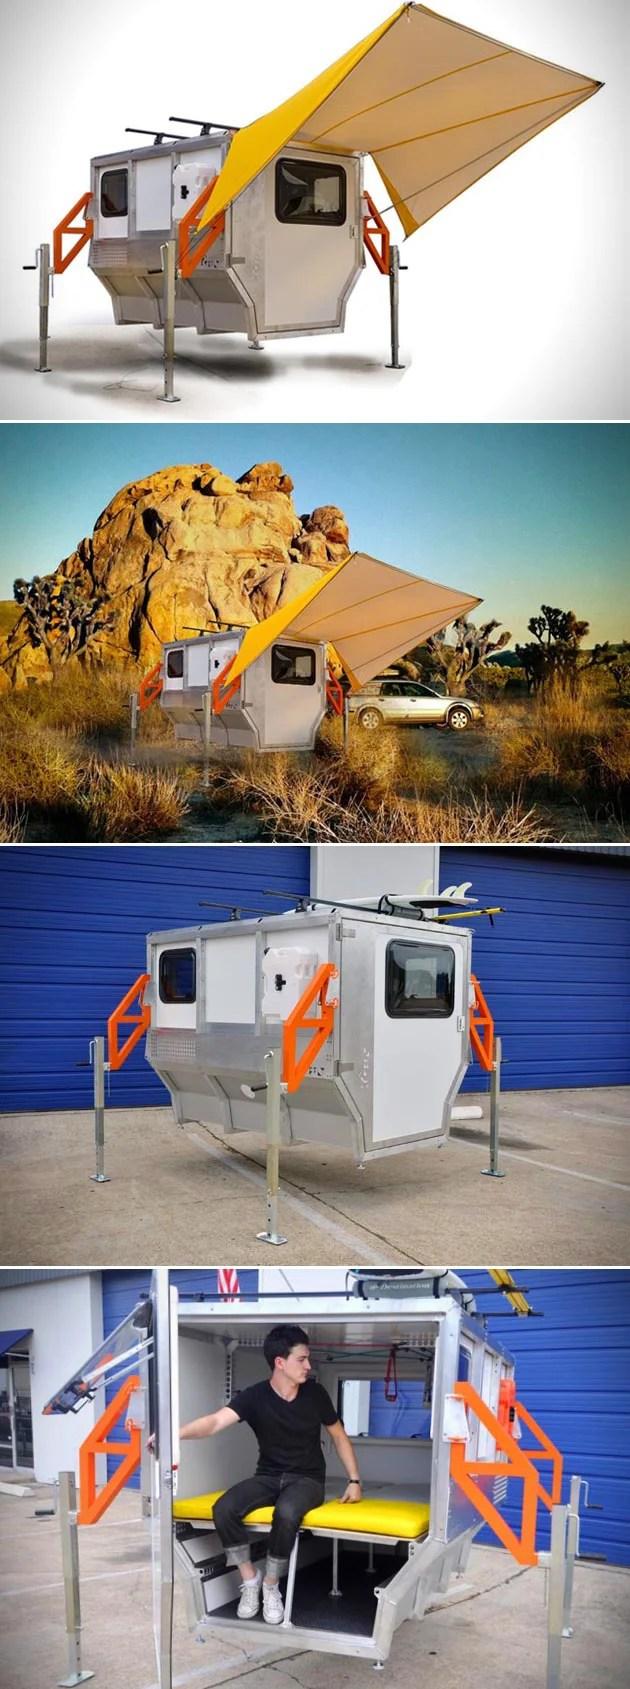 firefly-micro-camper-nasa